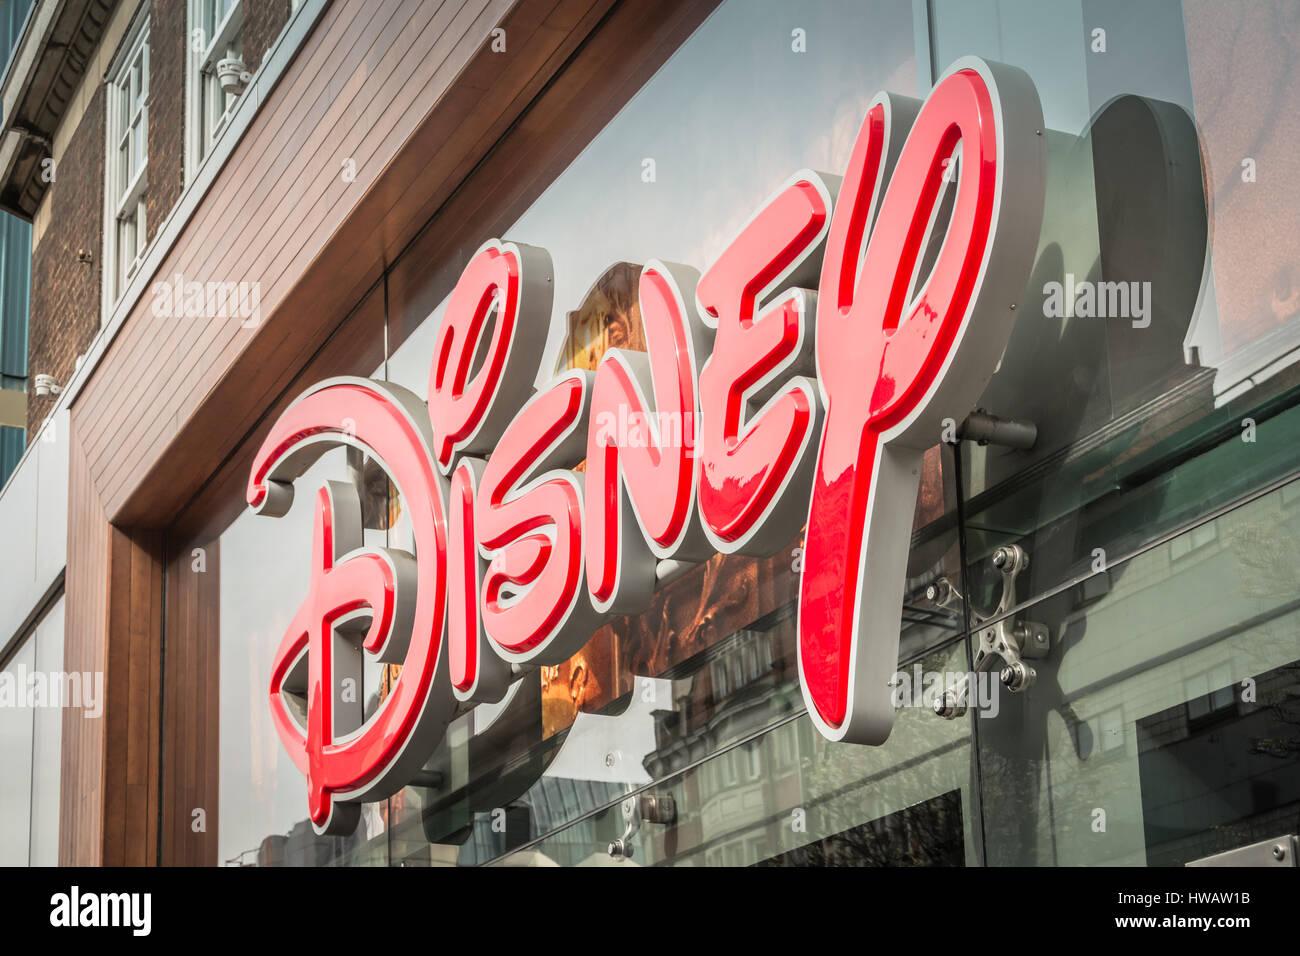 Disney Store, Oxford Street, London, UK Stock Photo